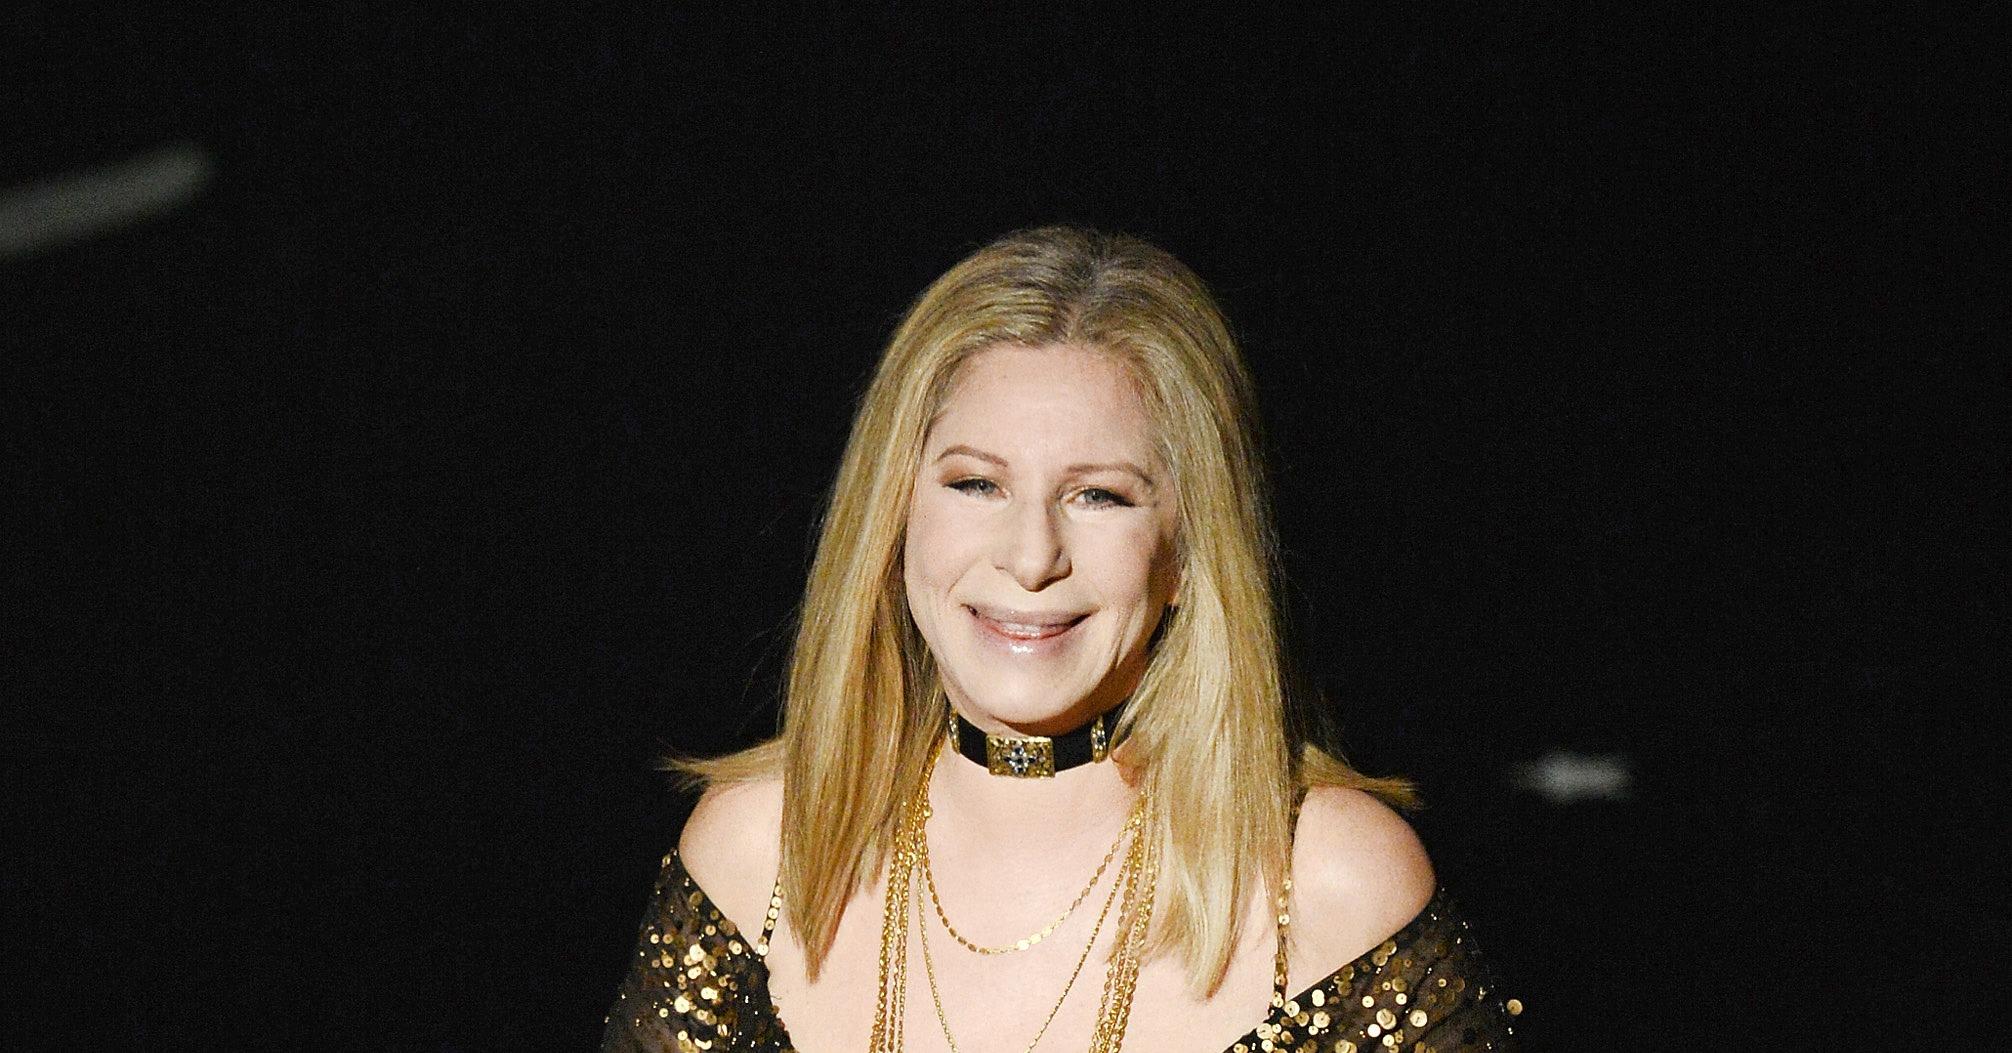 beautiful blonde hairstyles : Barbra Streisand Guilt Trip Hairstyle Barbra-streisand-sang-2013 ...